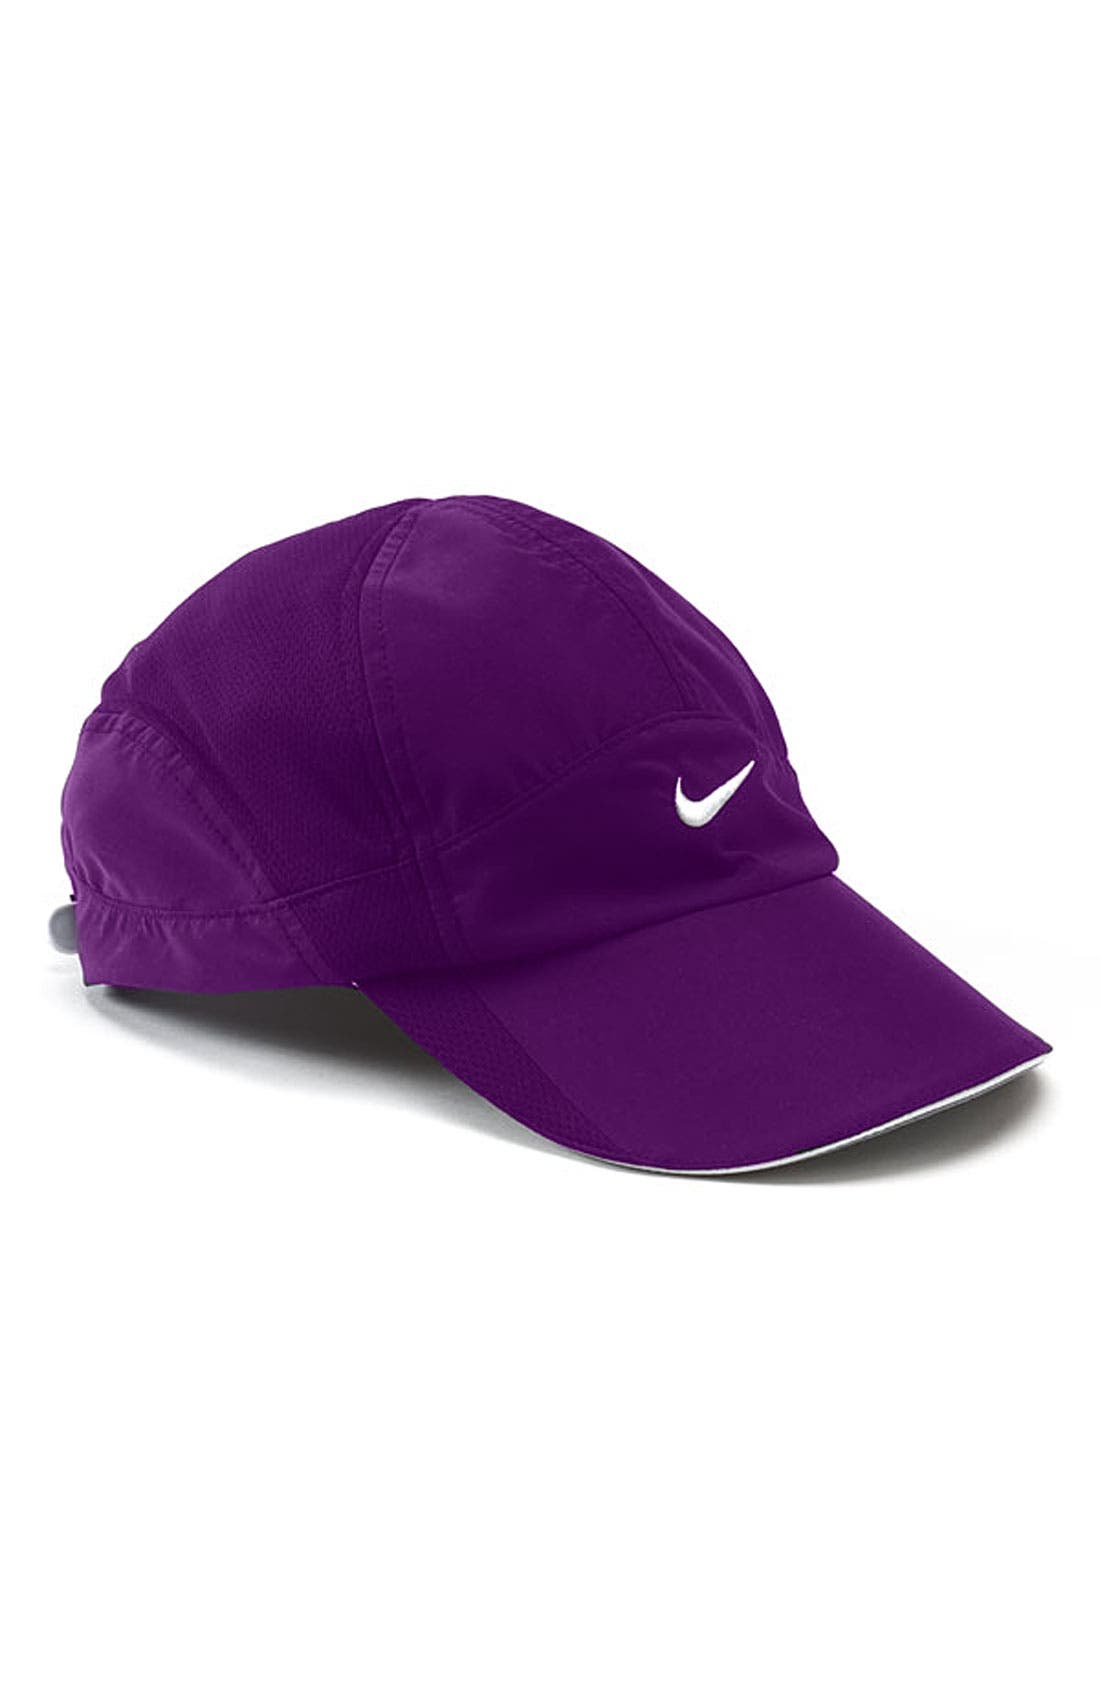 Main Image - Nike 'Feather Light' Cap